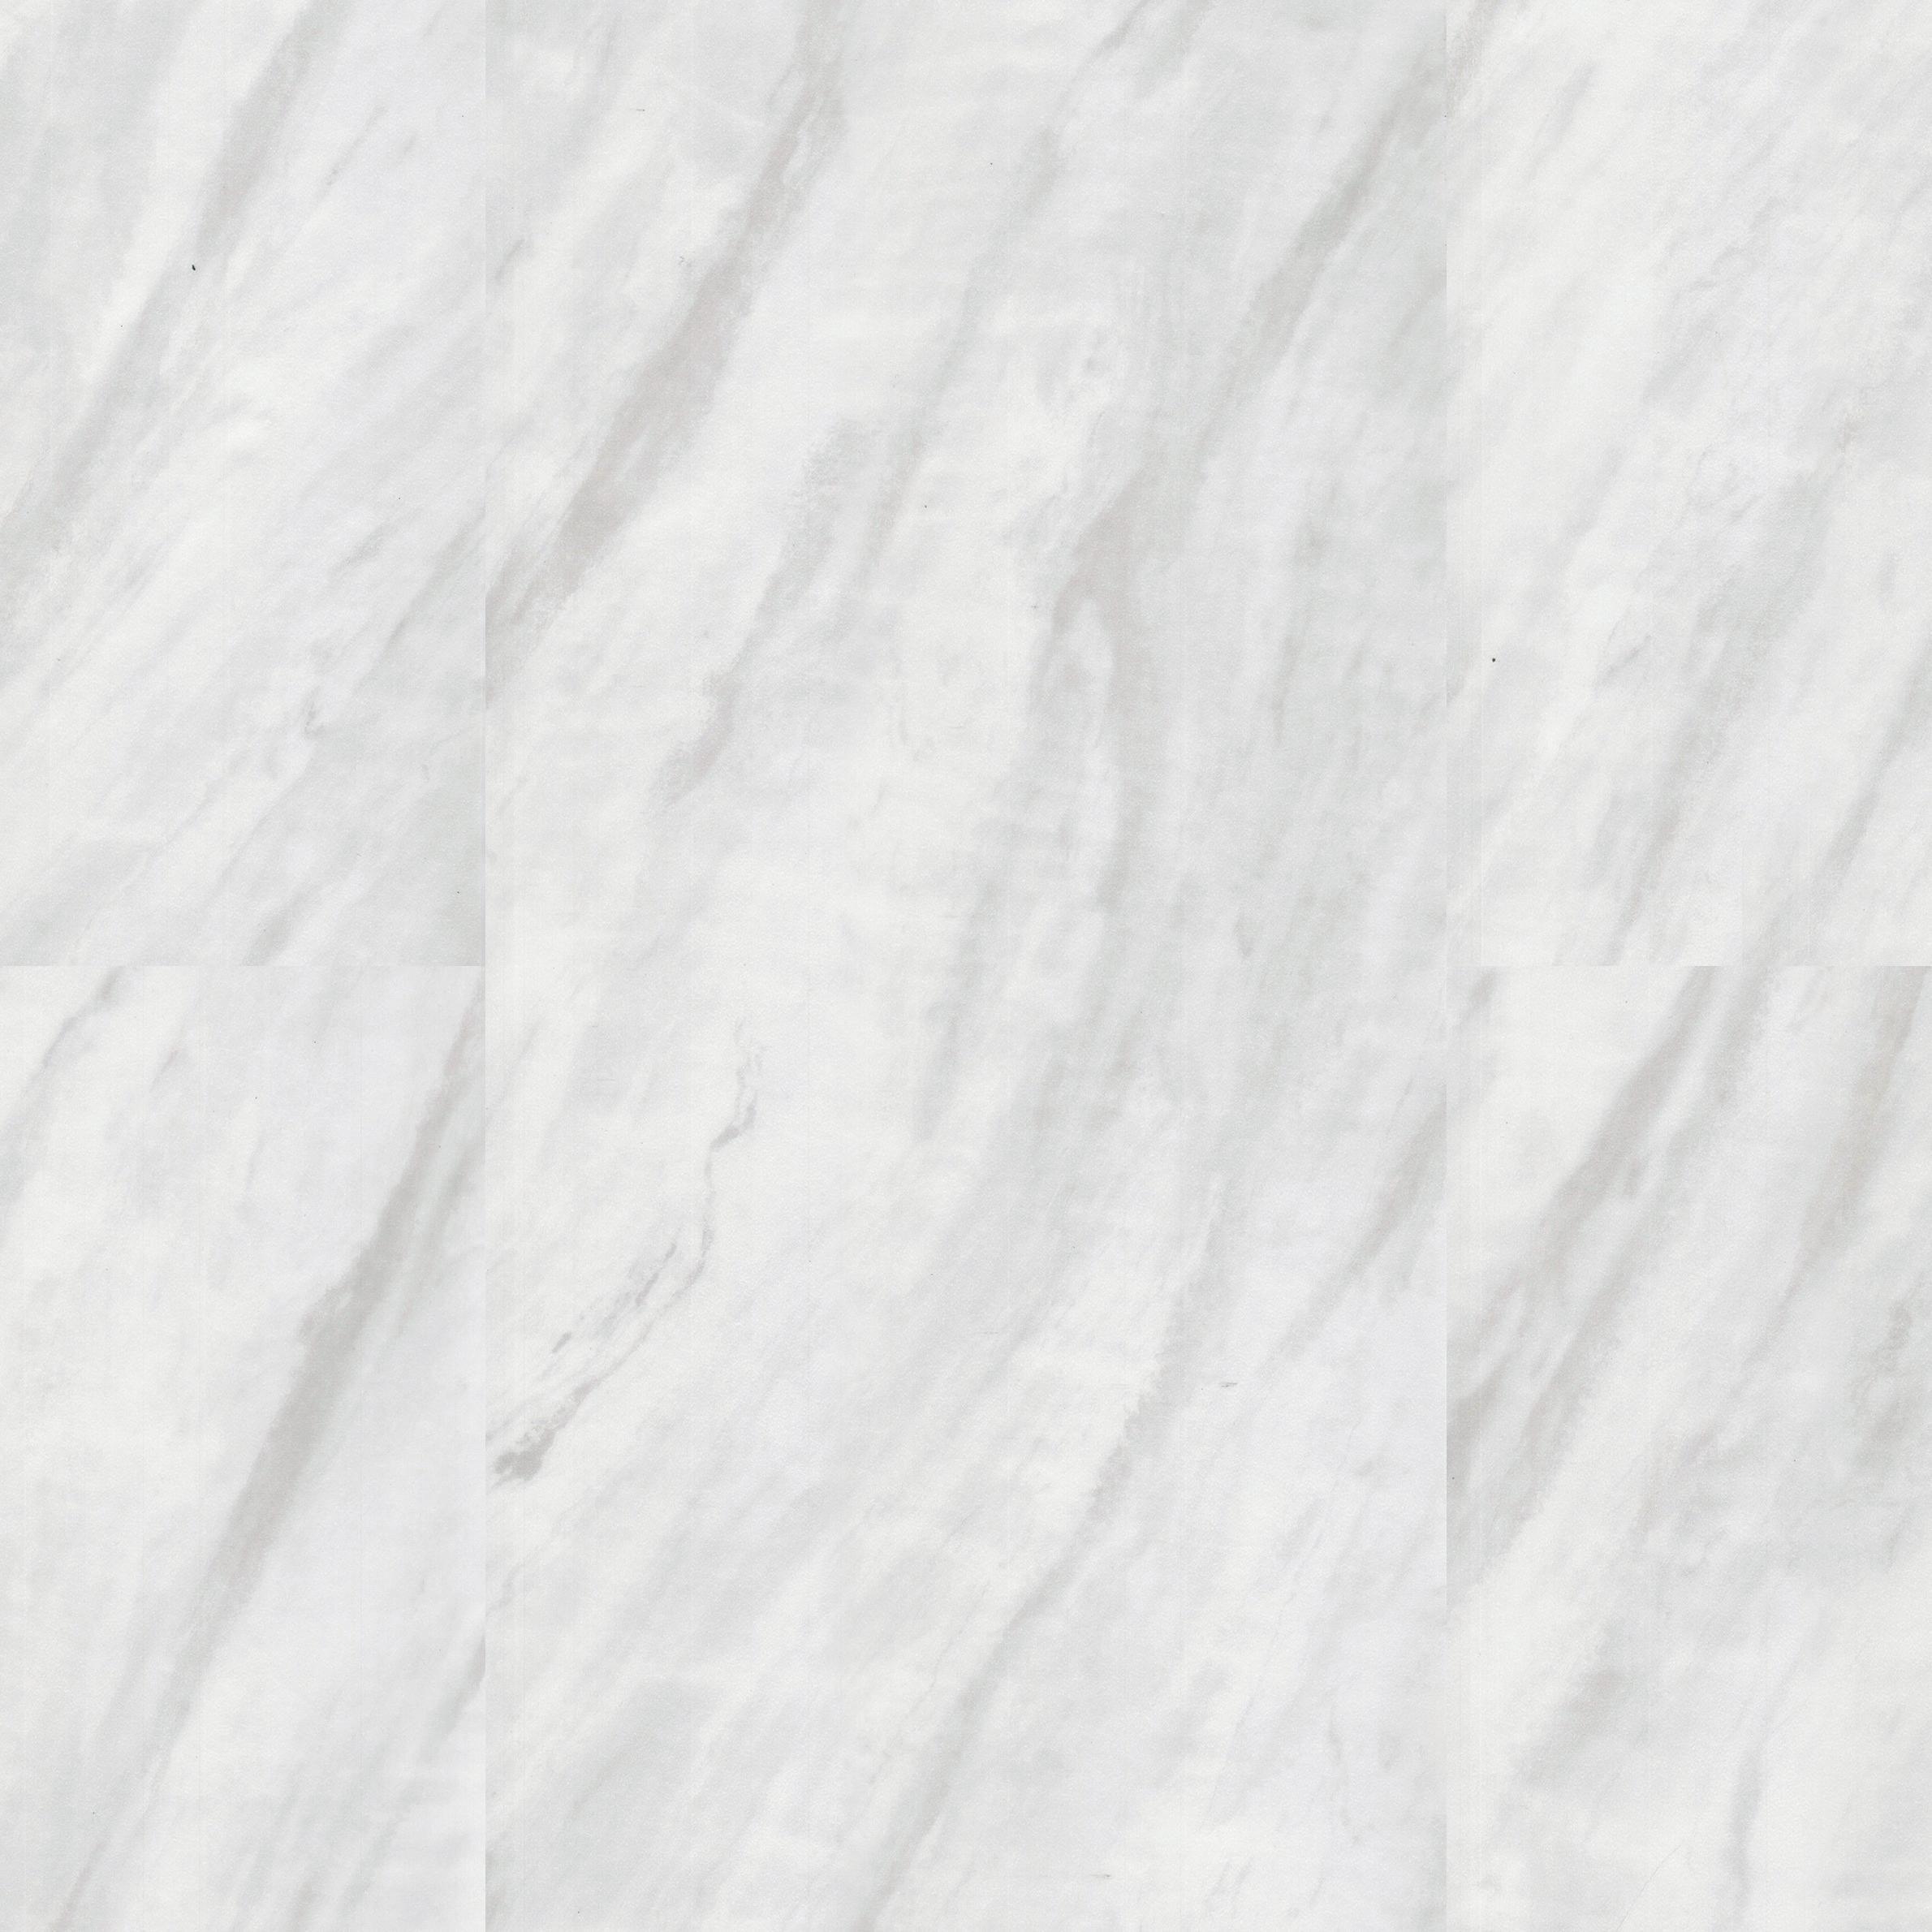 Vinyl Sheet Flooring For Bathroom. Image Result For Vinyl Sheet Flooring For Bathroom